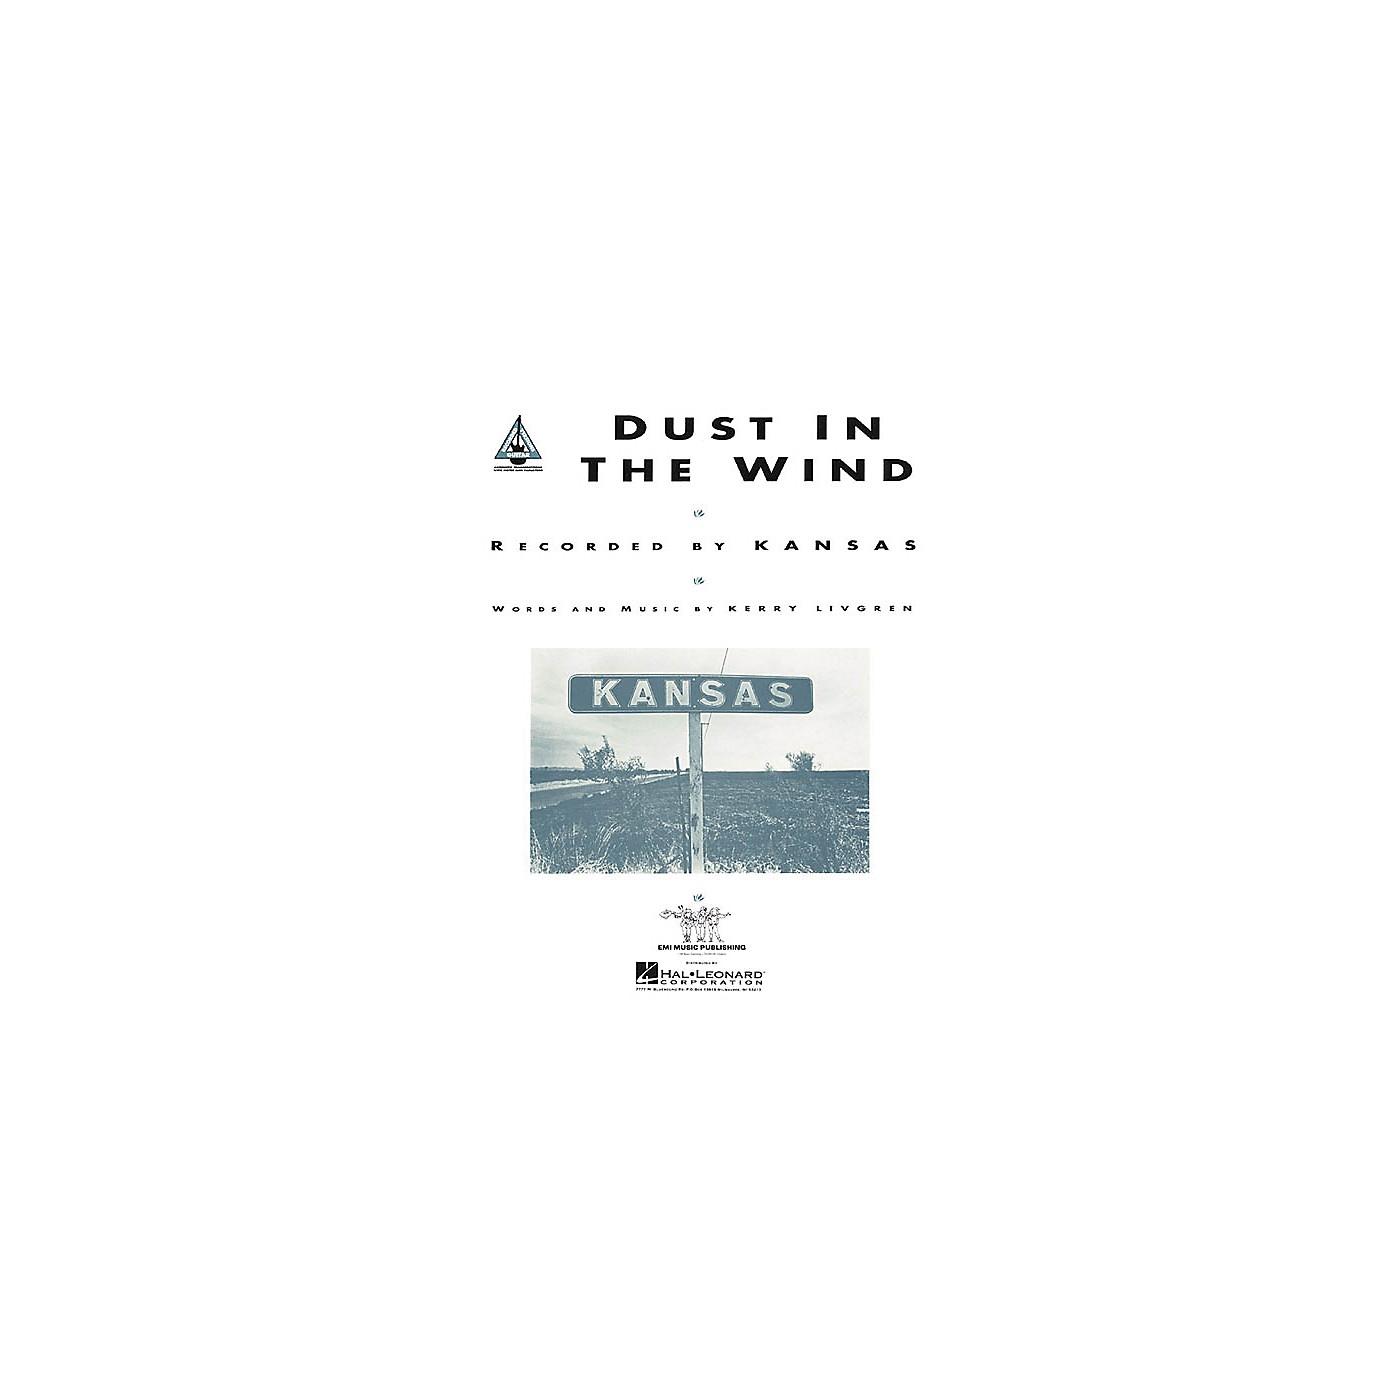 Hal Leonard Kansas: Dust in the Wind (Sheet Music) thumbnail